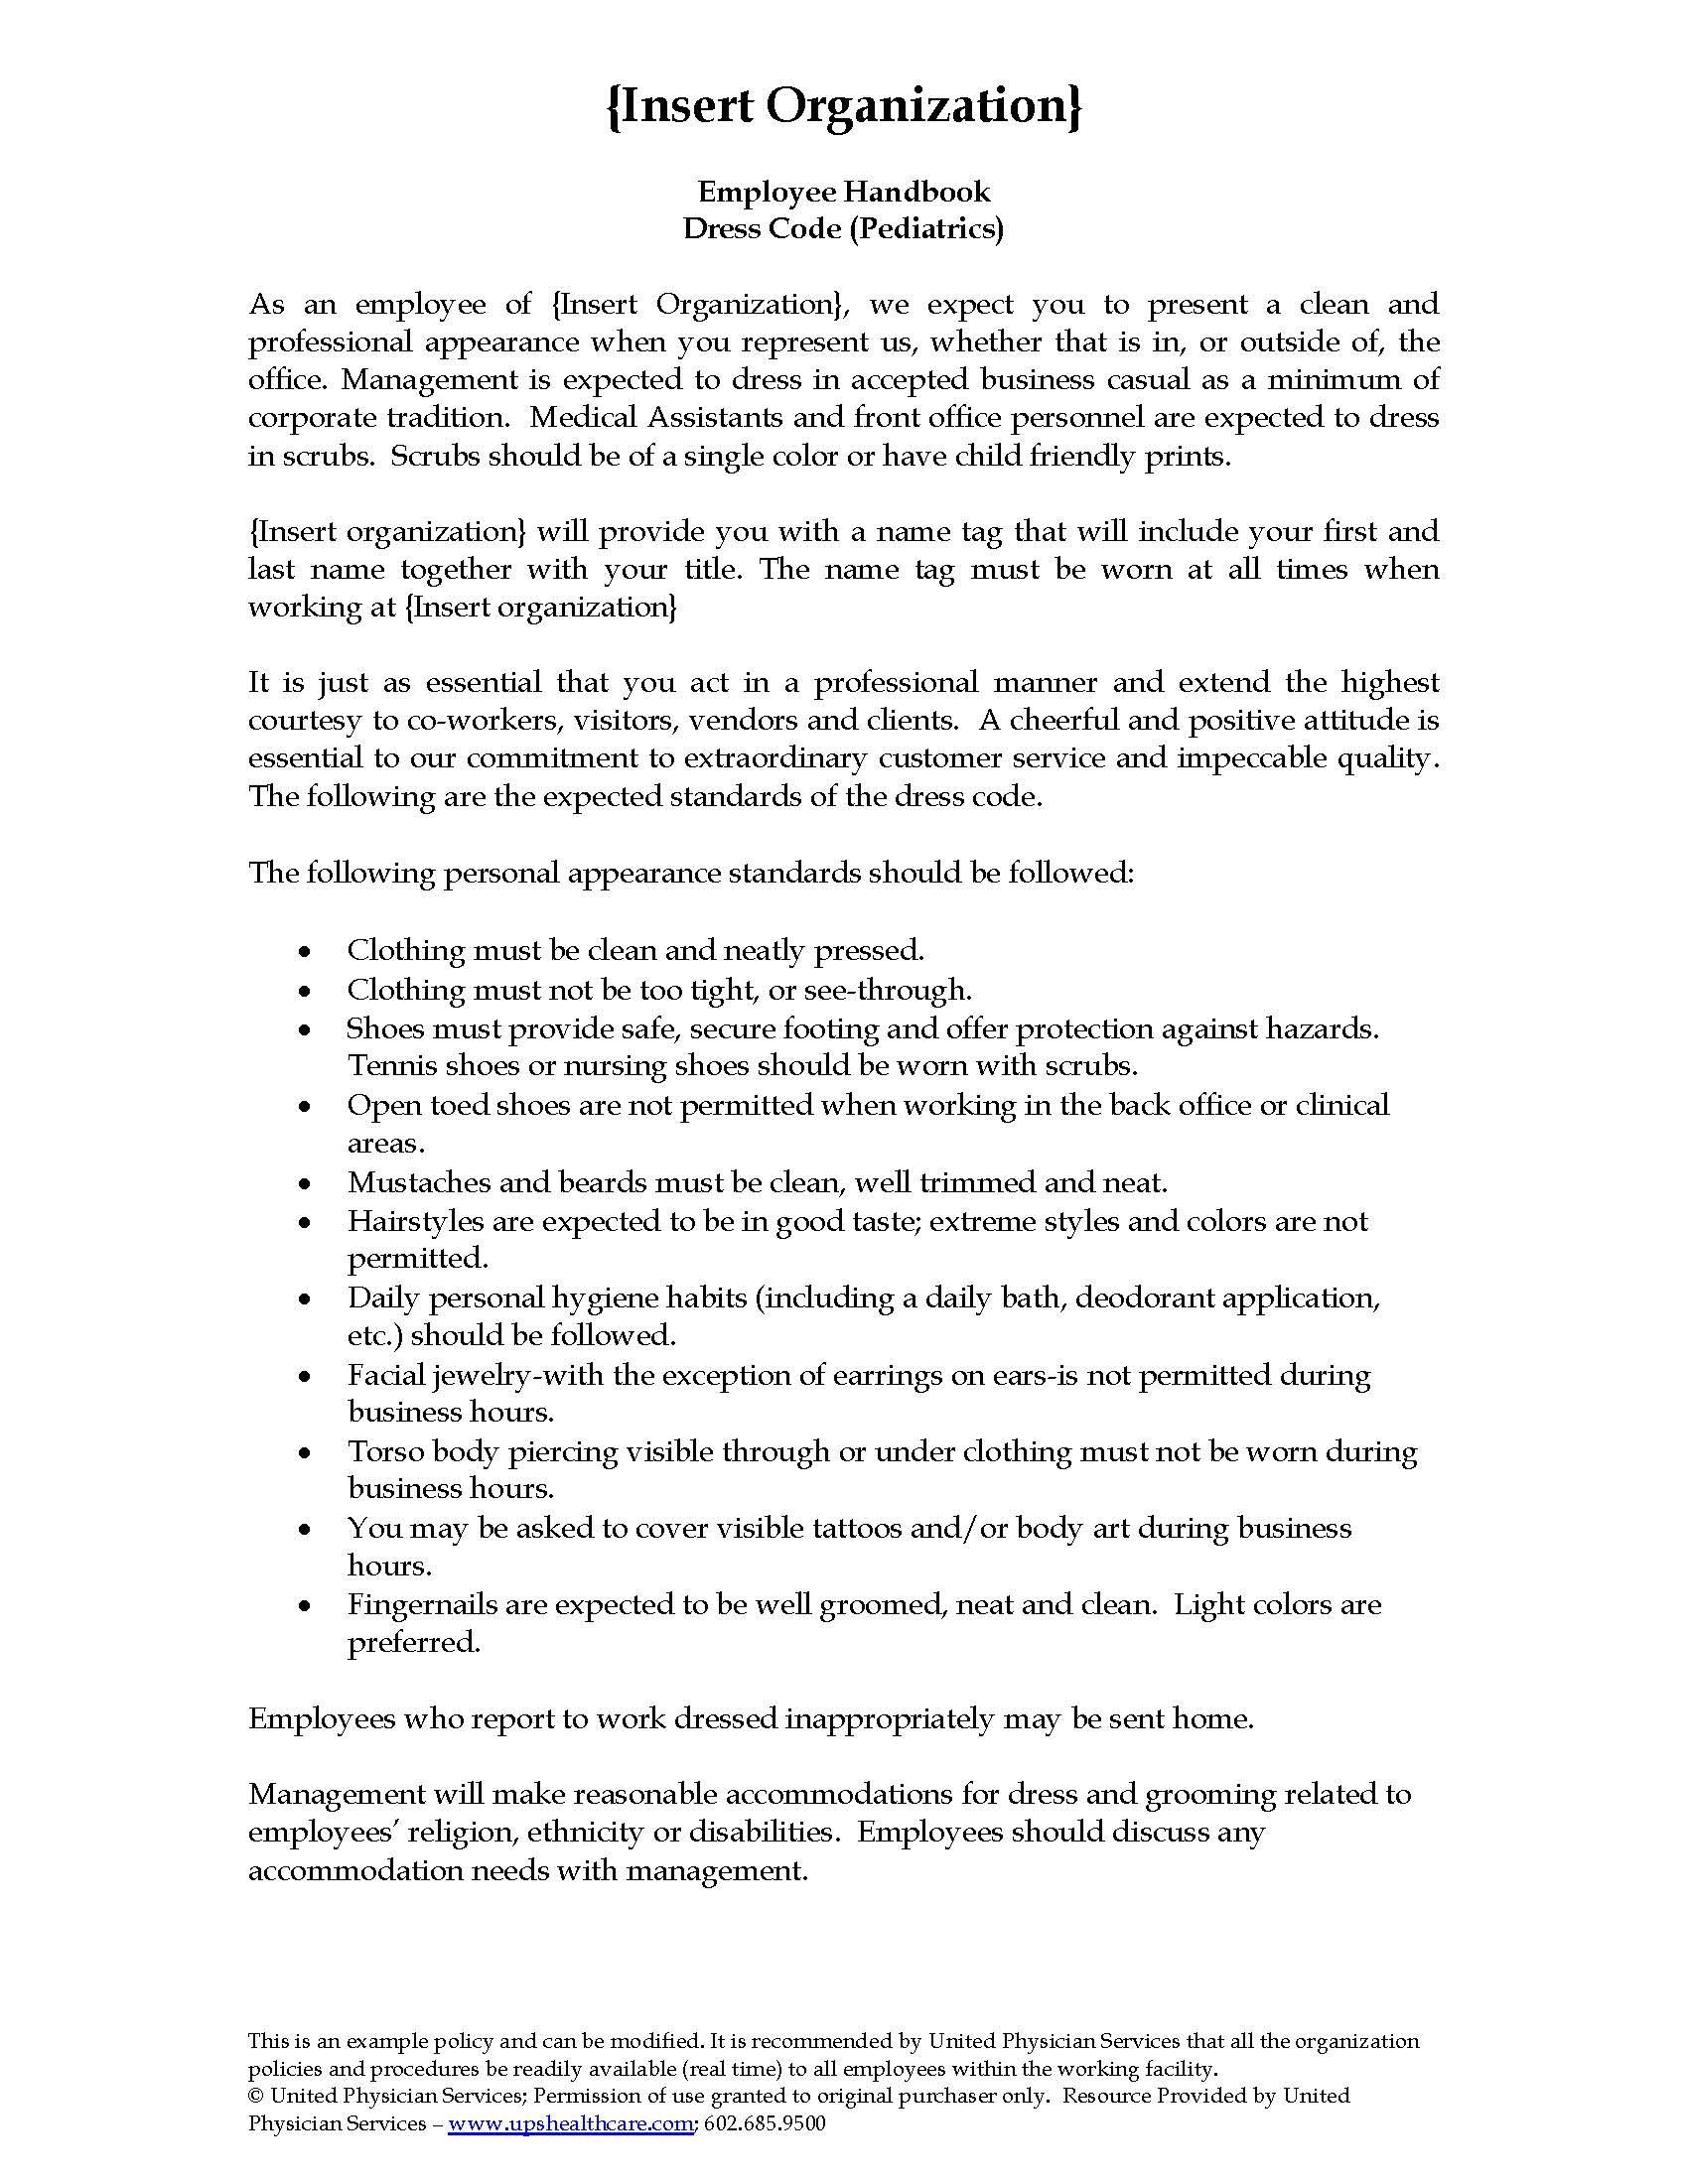 dress code pediatrics united physician services